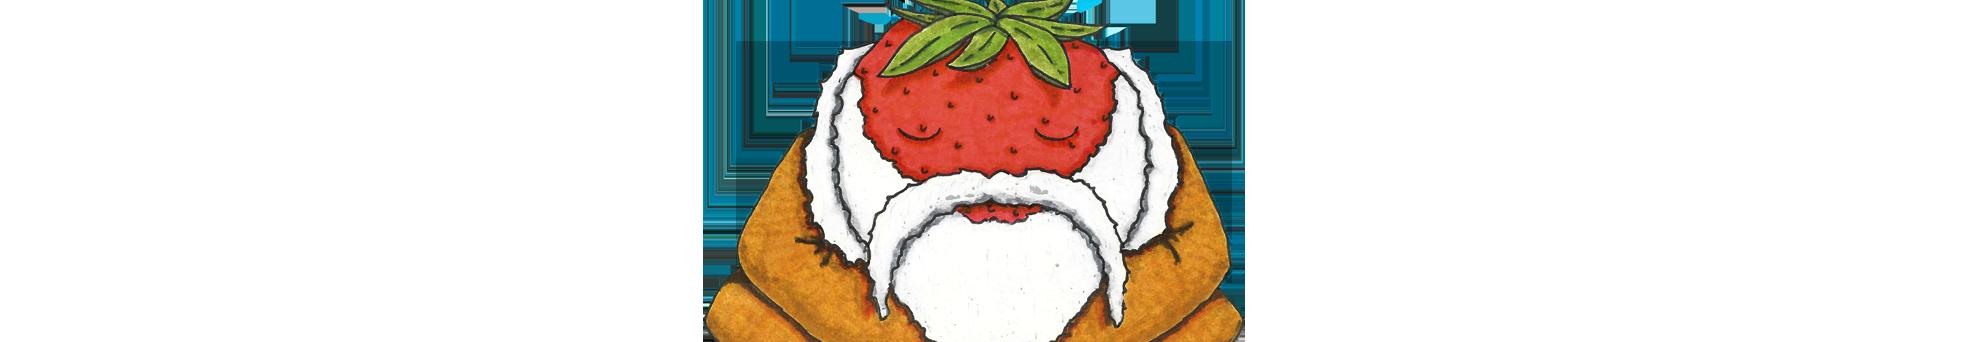 Strawberry sage aqua vitea. Strawberries clipart eye